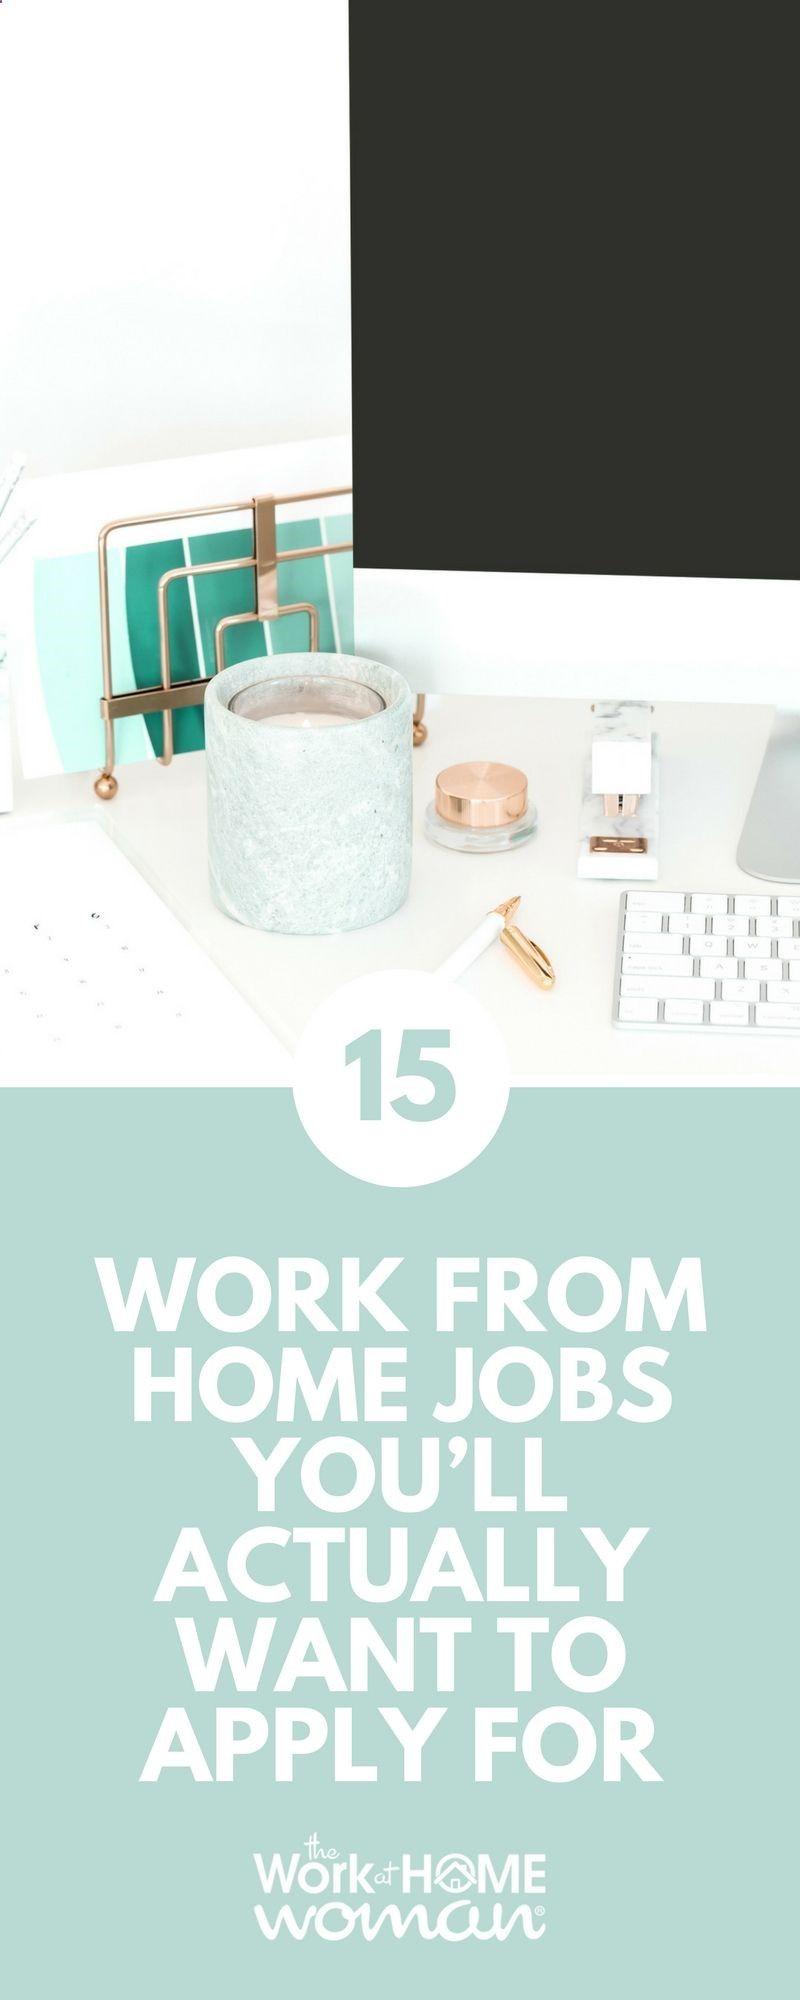 Work from home jobs Trabajos en casa, Making ideas